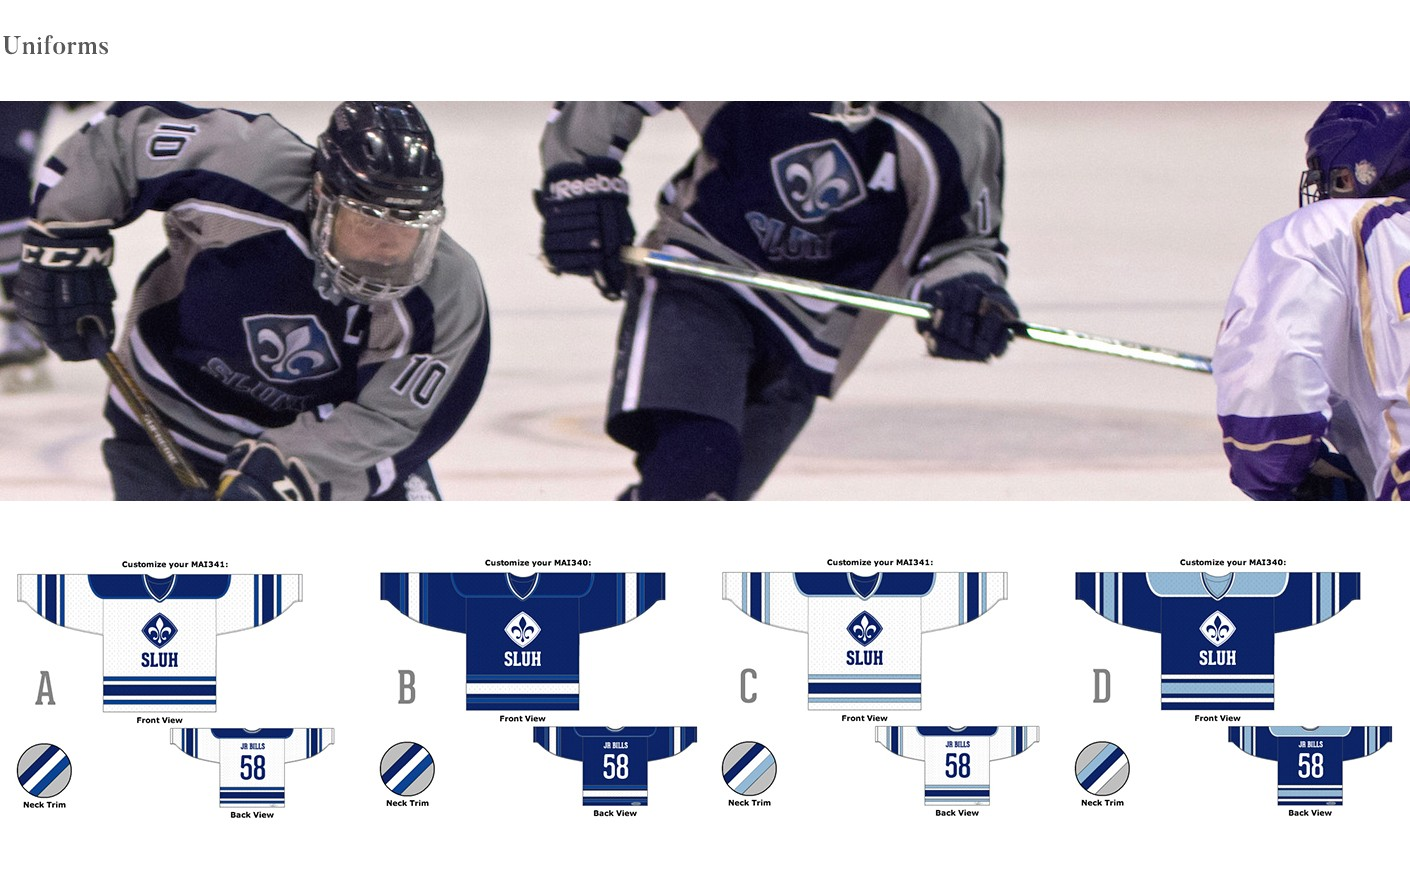 sluh uniform design